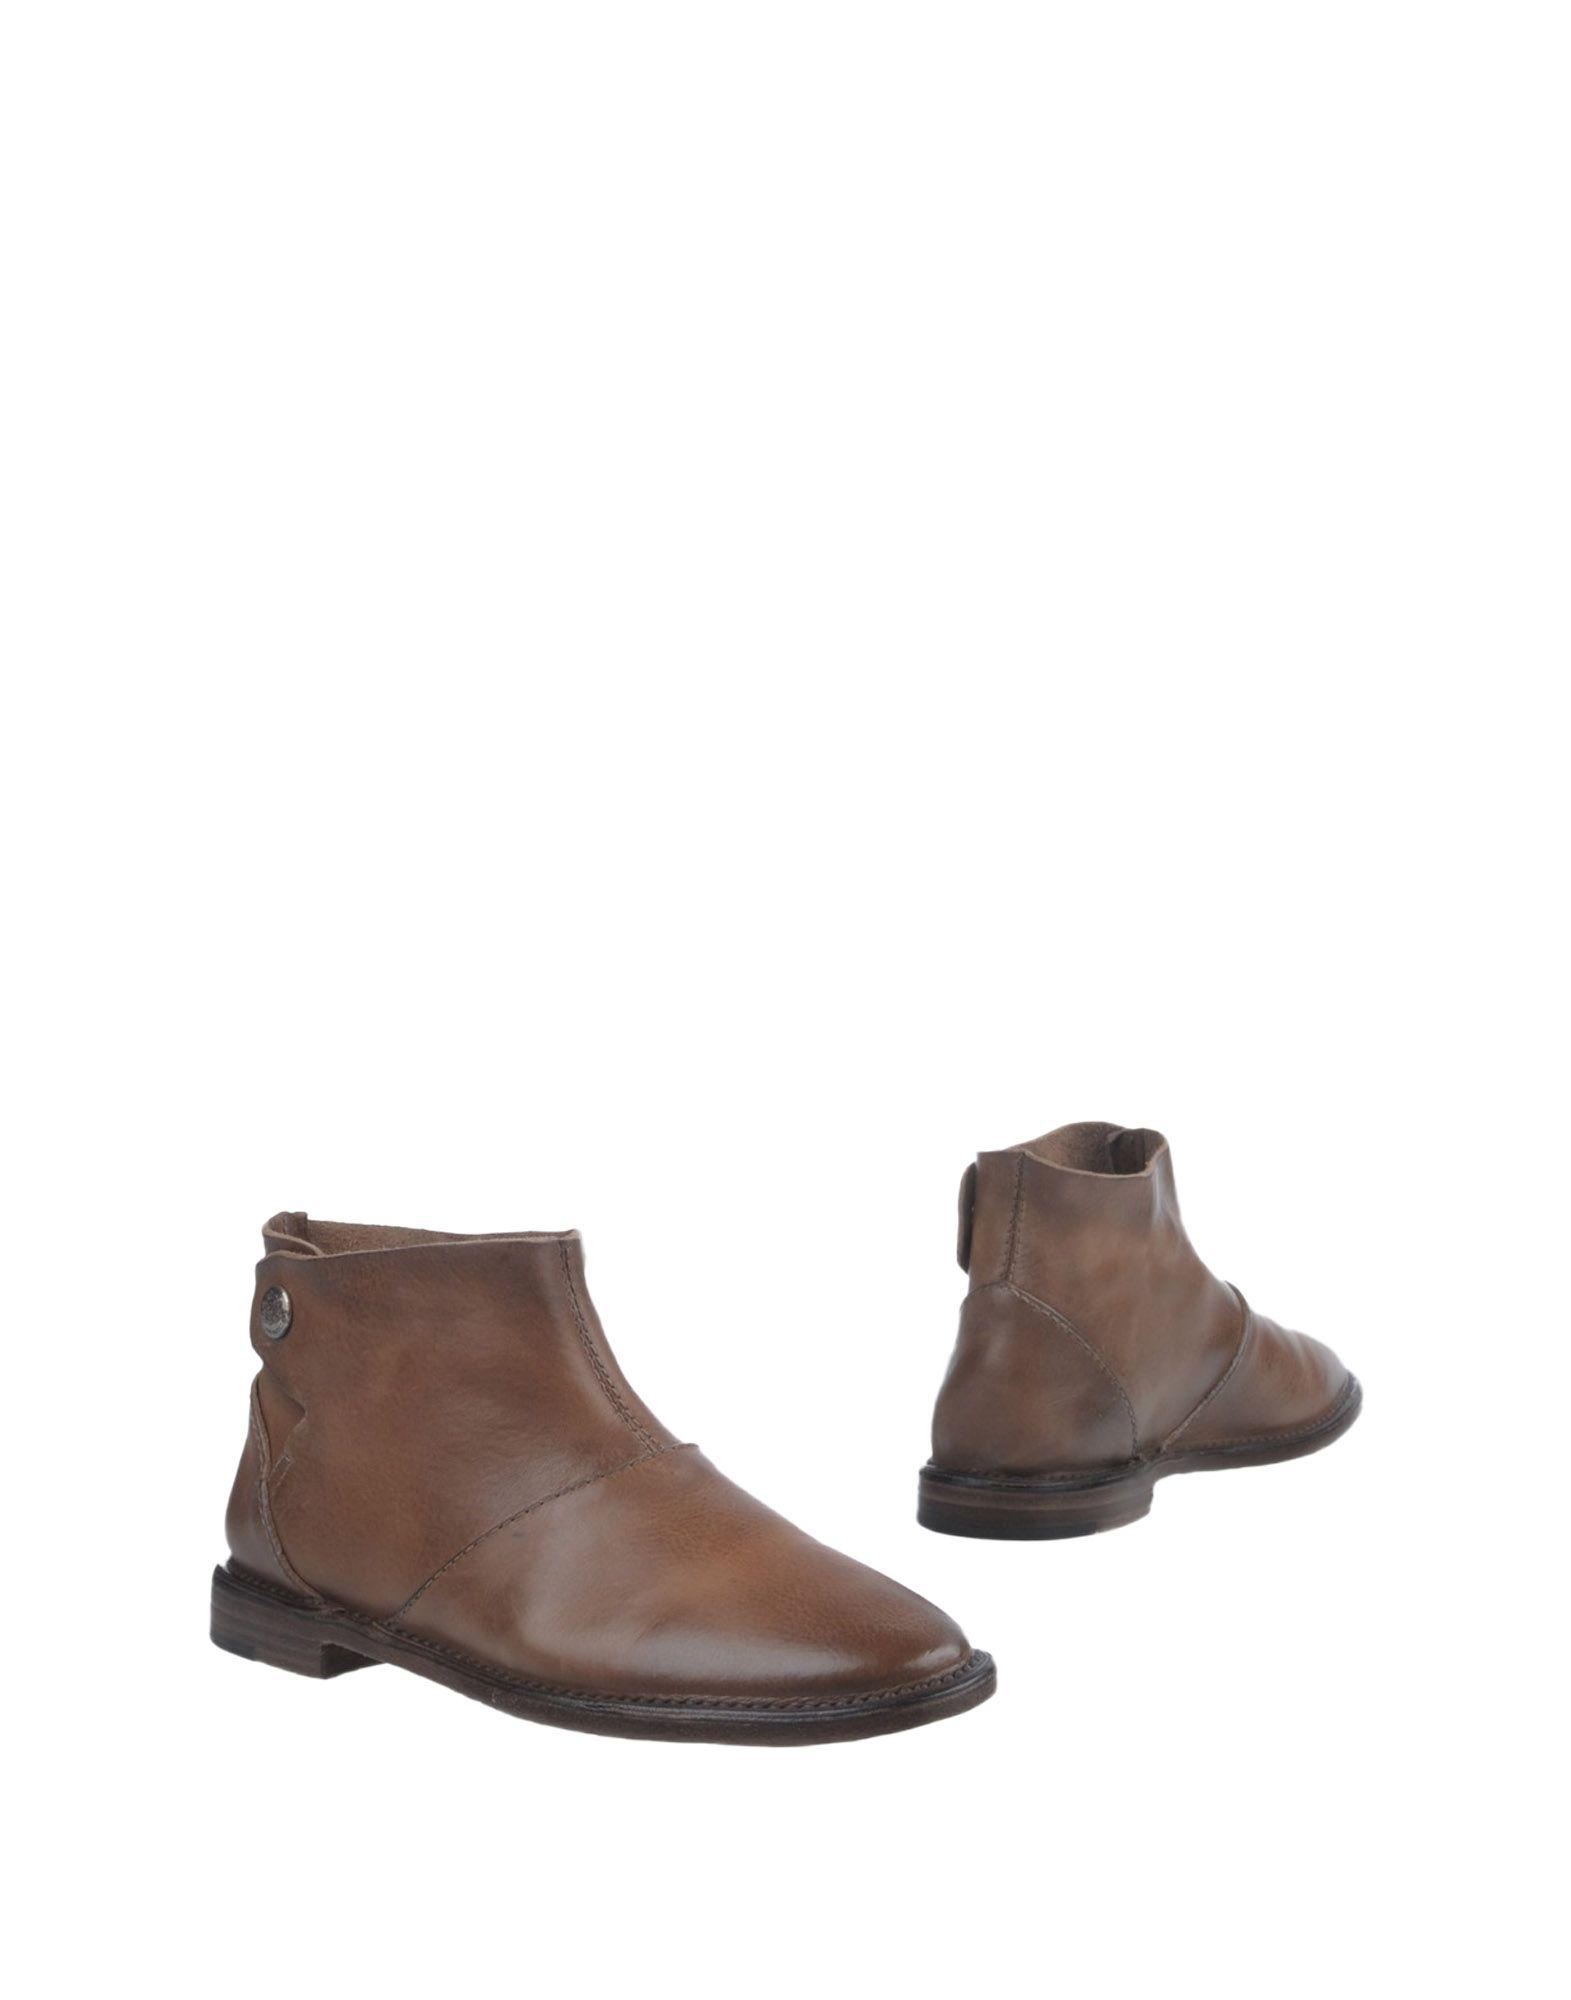 Alberto Fasciani Neue Stiefelette Damen  11386649LF Neue Fasciani Schuhe 117018